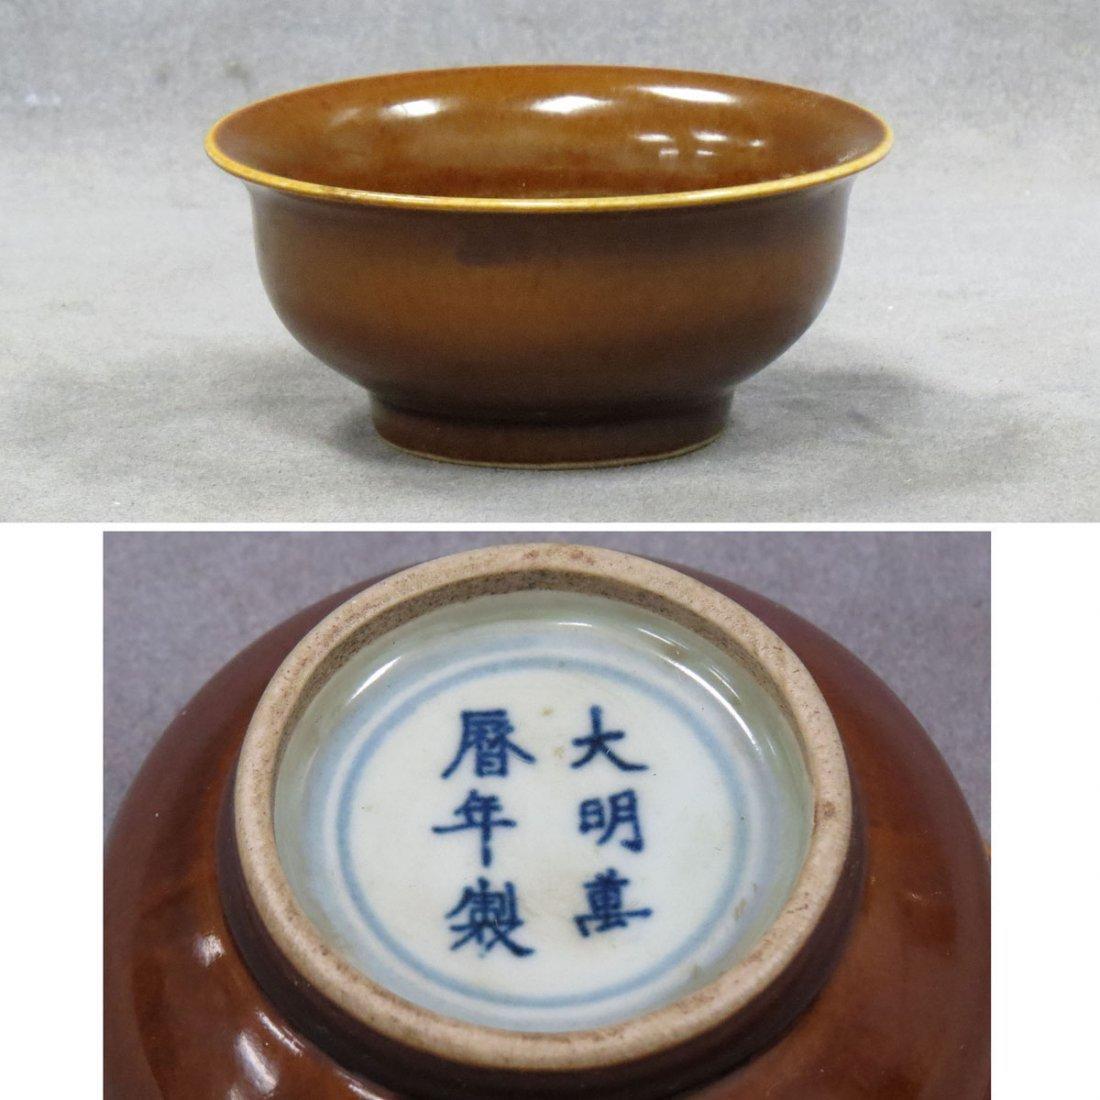 CHINESE BROWN GLAZE PORCELAIN BOWL